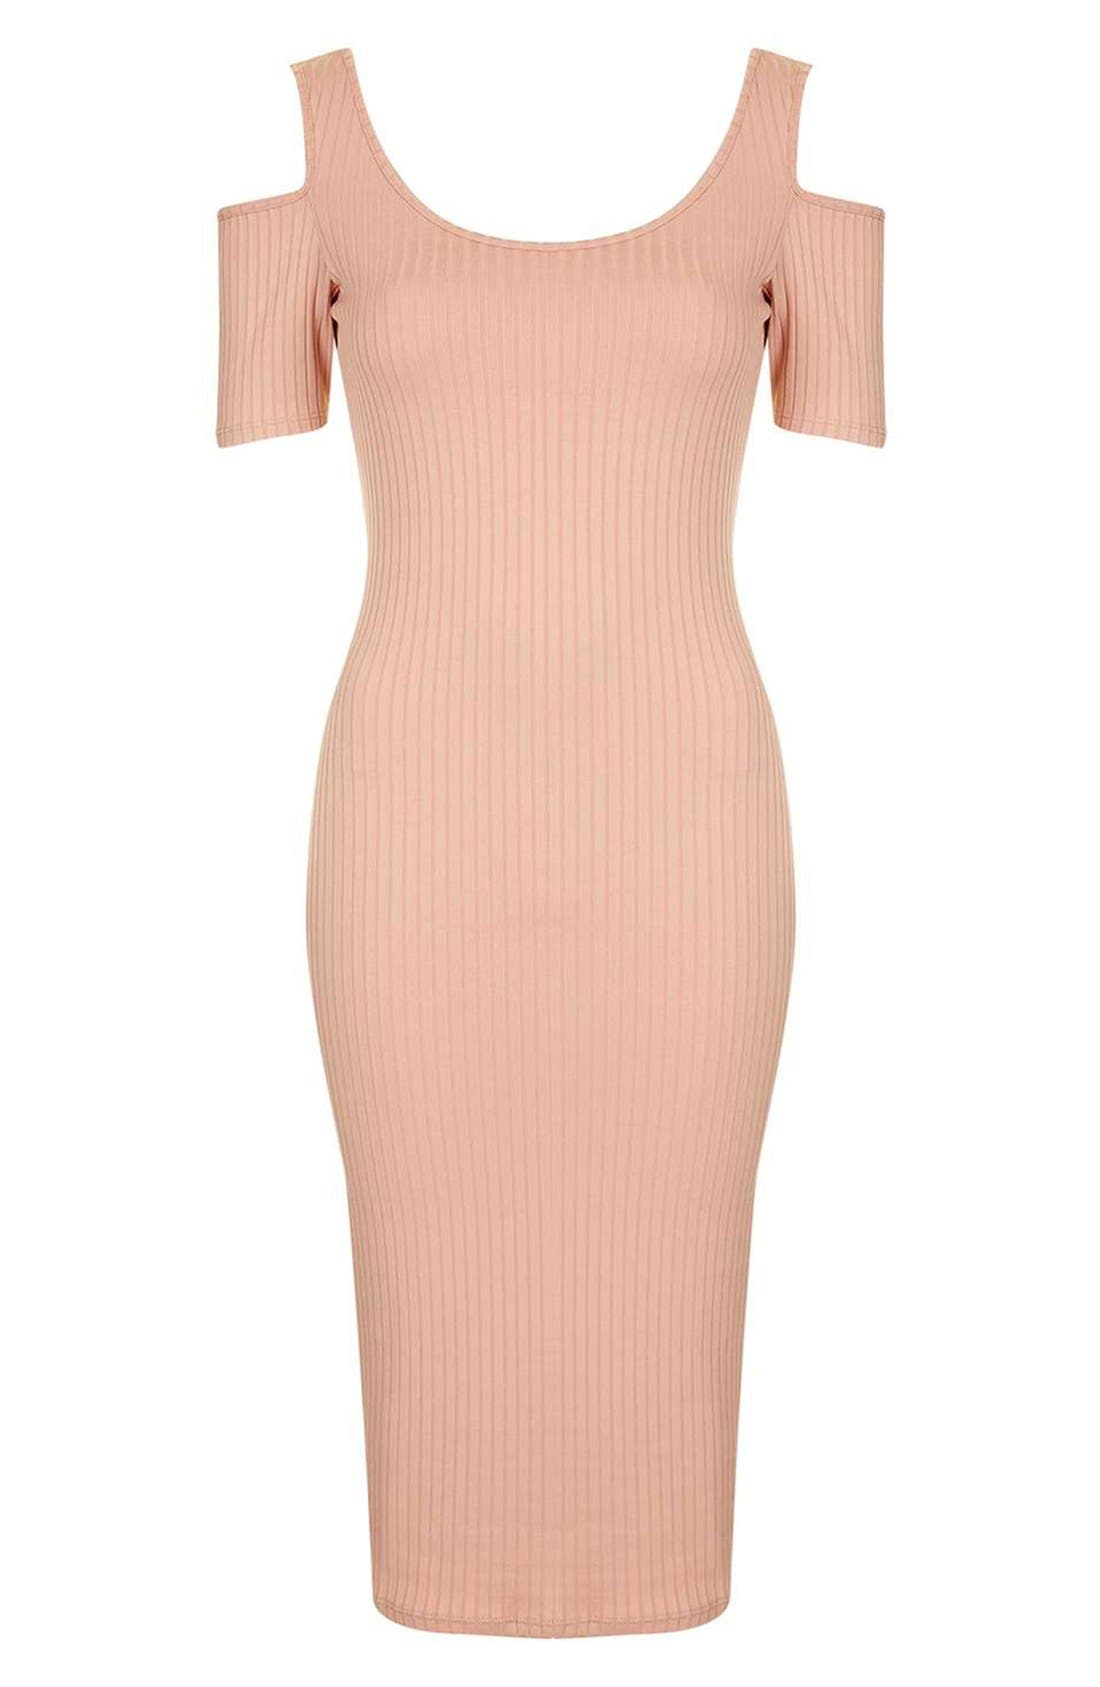 TOPSHOP, Cold Shoulder Ribbed Midi Dress, Alternate thumbnail 5, color, 250